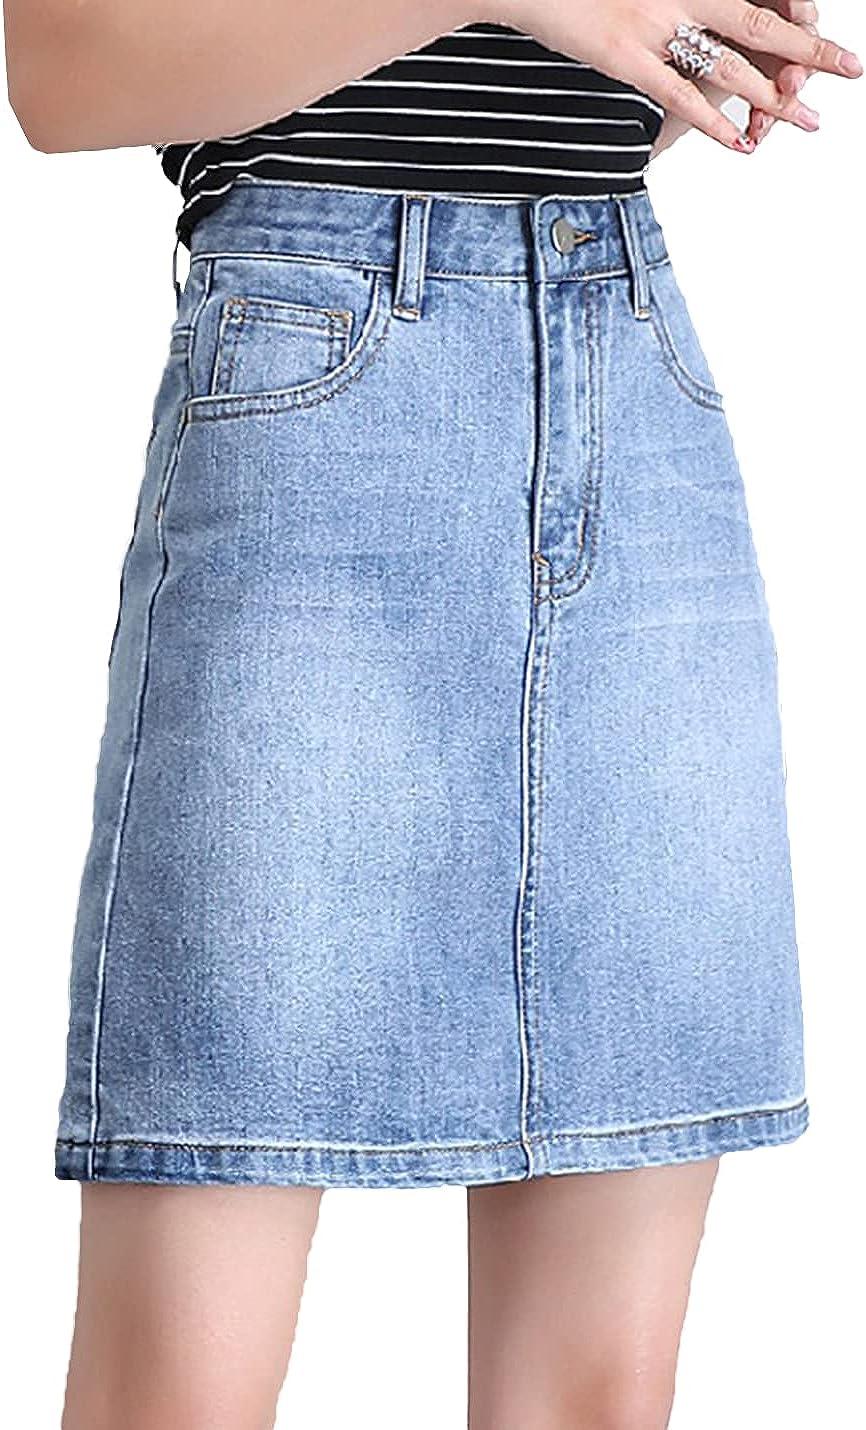 IKIIO Women's Casual Summer High Waist Slim Fit Skirts Denim Stretch Skirt with Pockets